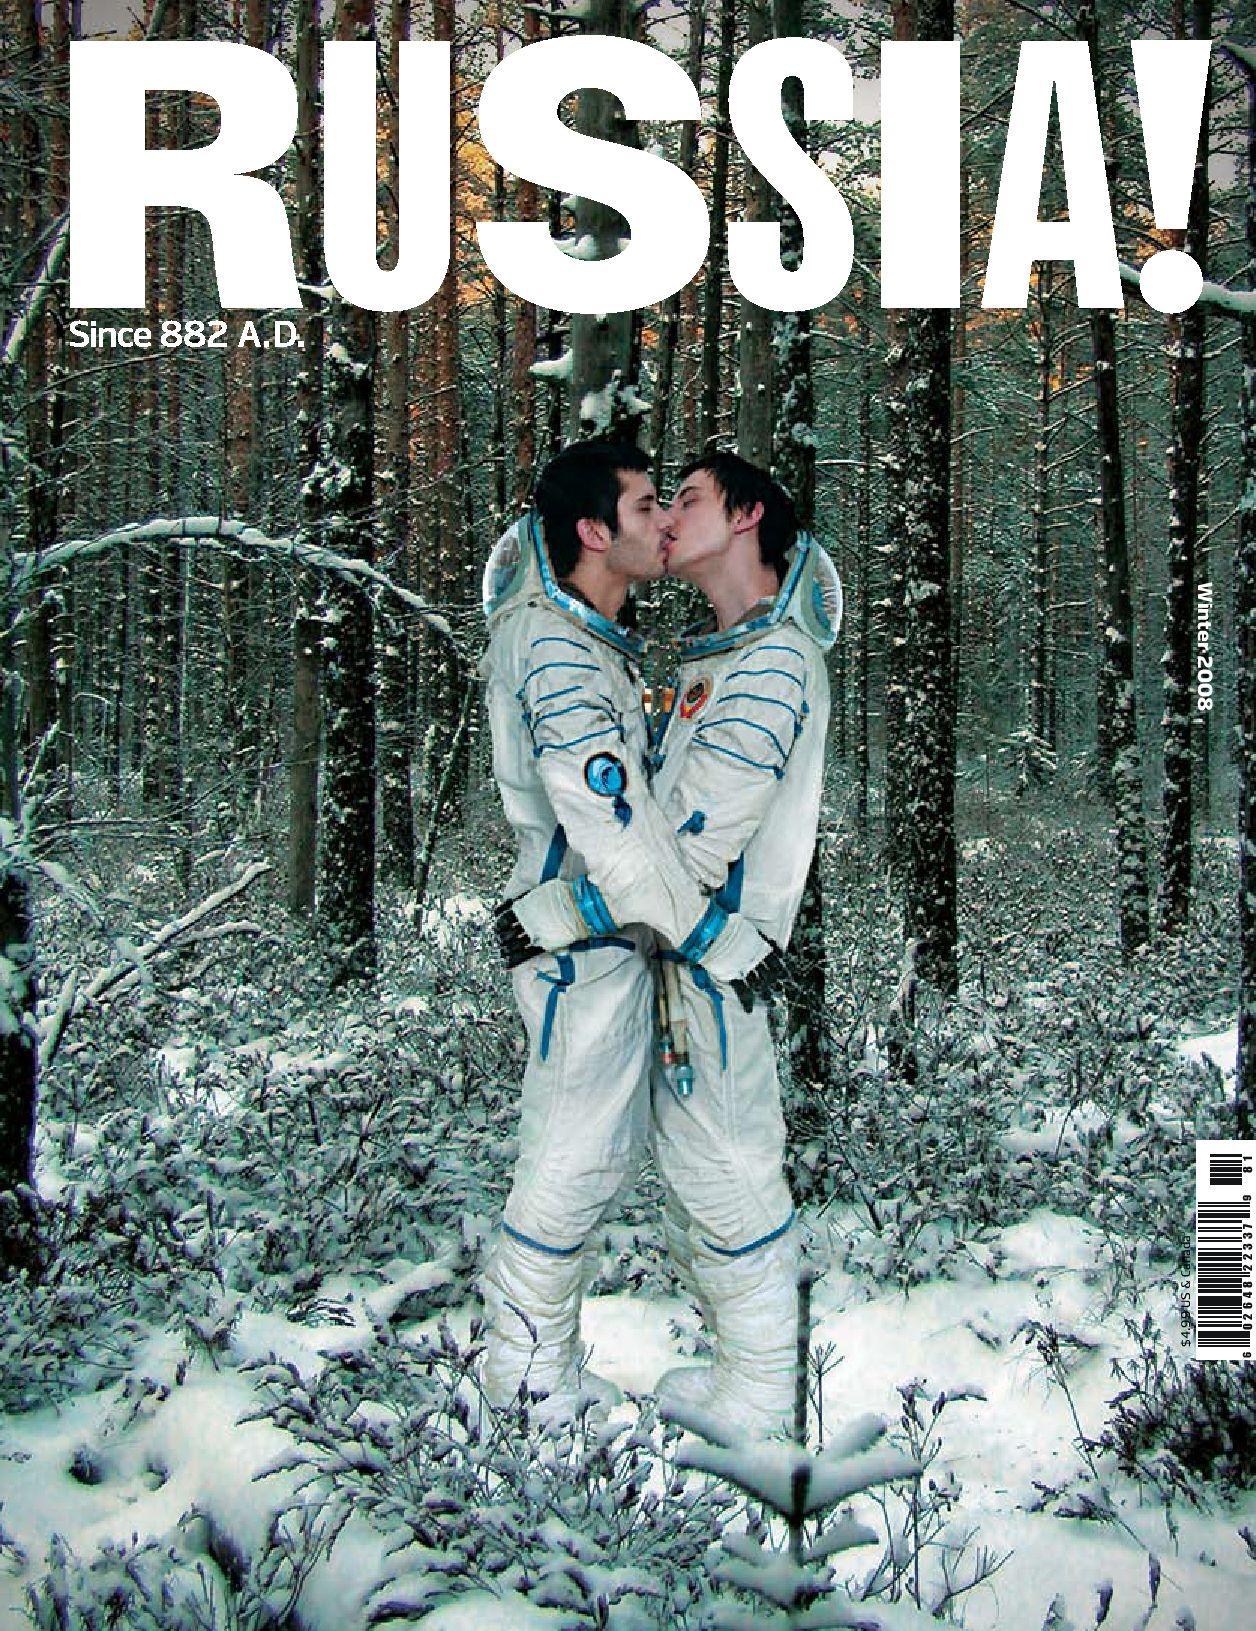 Trolling the USSR in Gaidai and Ryazanov 31